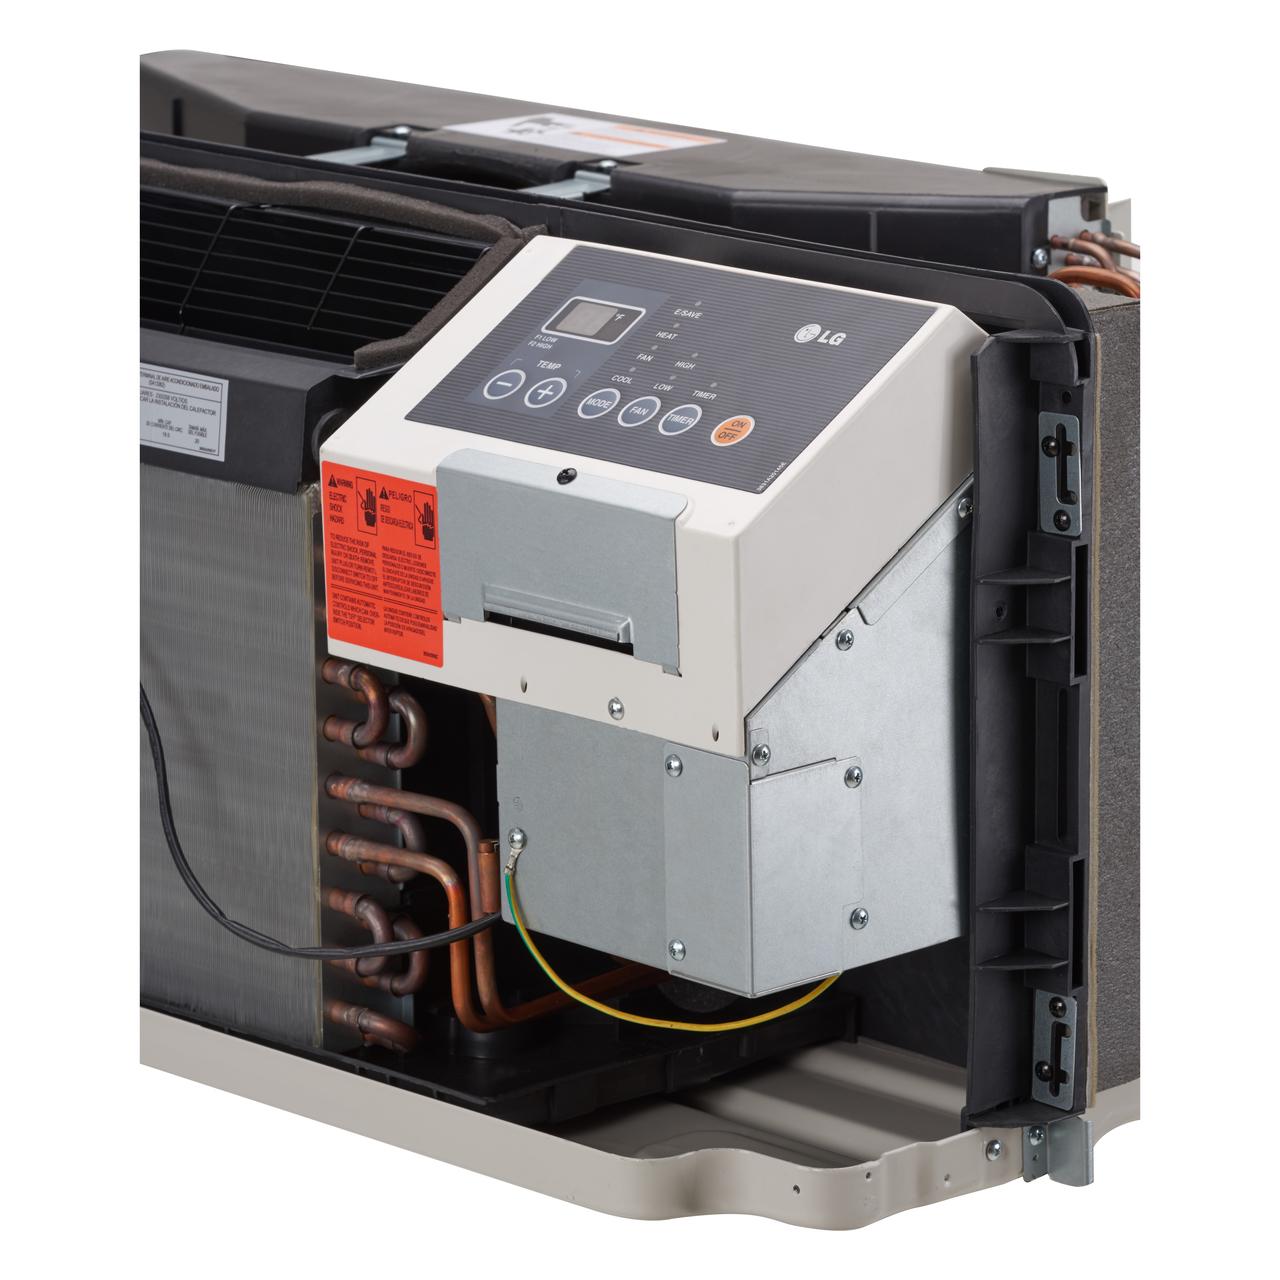 Lg Lp073hduc 7000 Btu Ptac Air Conditioner Heat Pump Wiring Diagram And Parts List For Amana Airconditionerheat